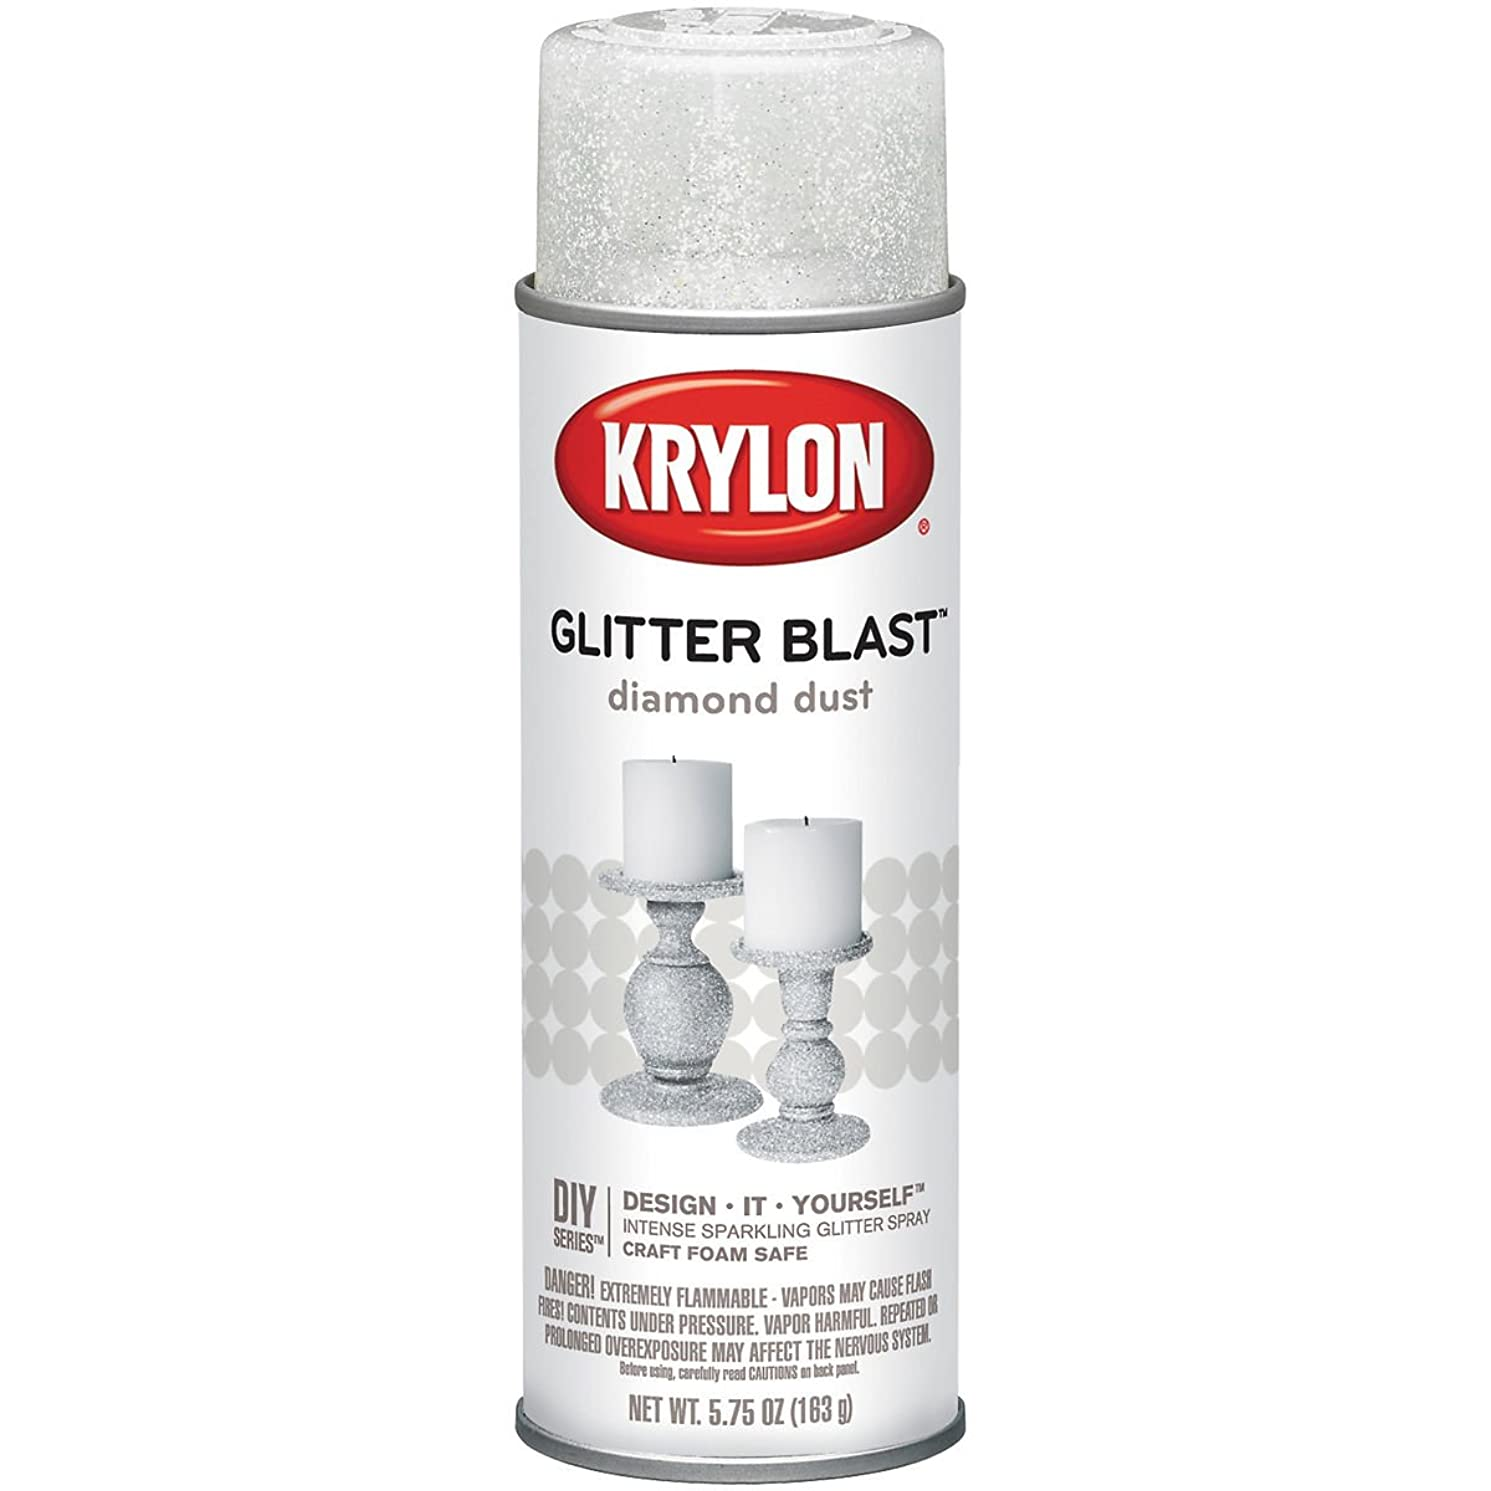 Krylon 3804 Glitter Blast Spray Paint Diamond Dust, 5.75 Ounce (6 Pack)